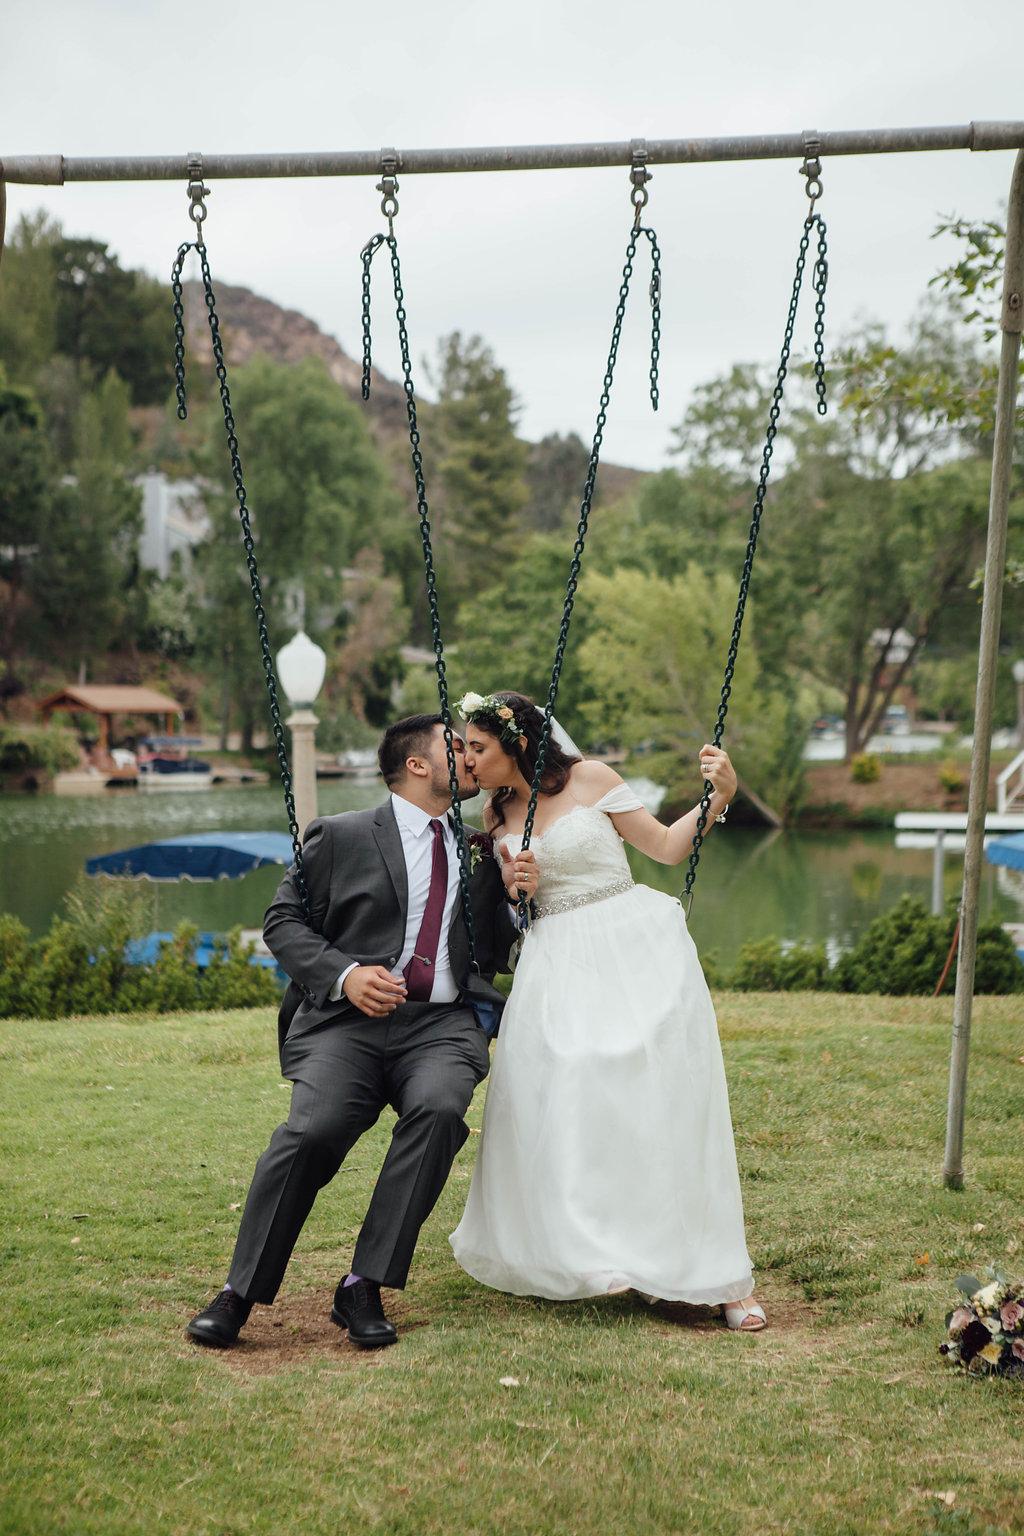 Christina&Steve061116_386.jpg